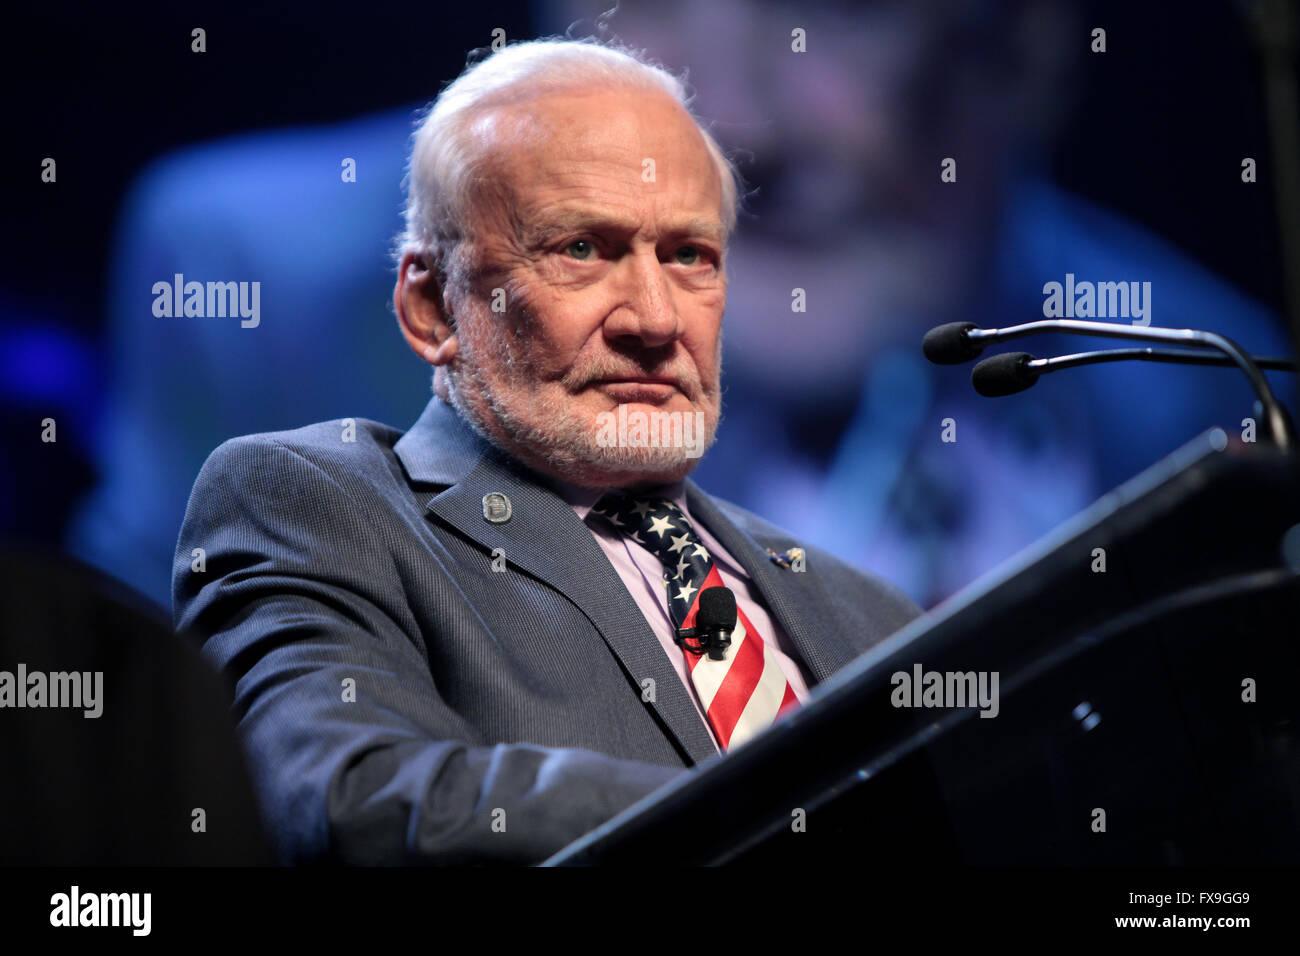 Phoenix, Arizona, USA. 12th Apr, 2016. Former Apollo astronaut Buzz Aldrin addresses attendees at the 2016 Cloud Stock Photo